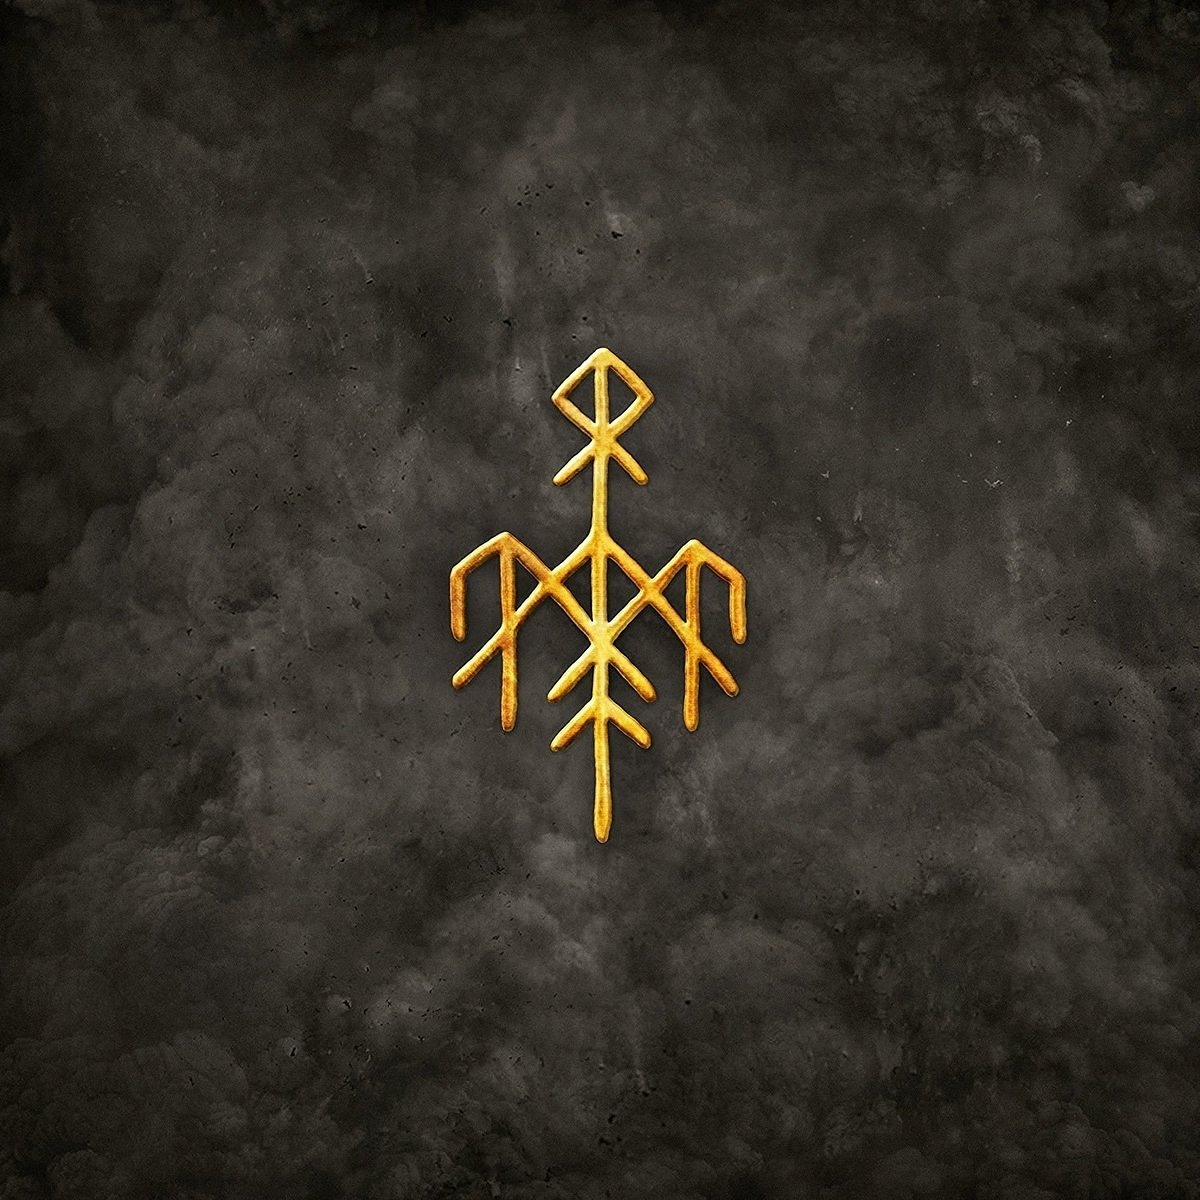 WARDRUNA - RUNALJOD - RAGNAROCK (CD)